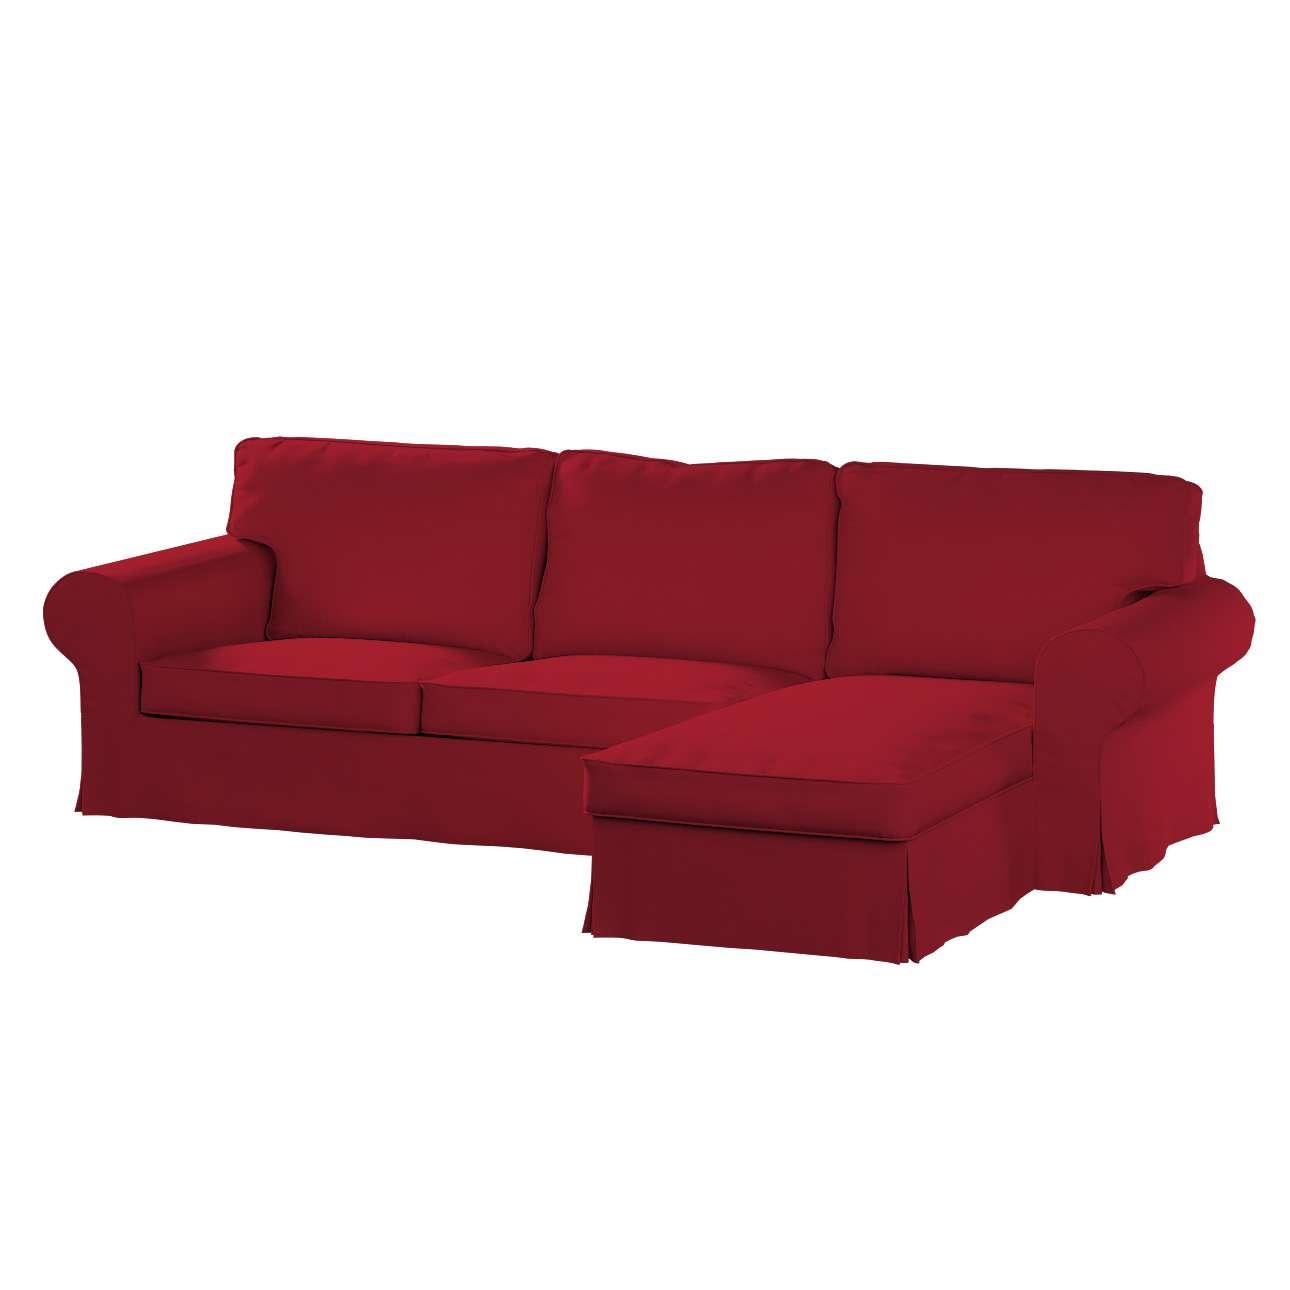 Ektorp 2-Sitzer Sofabezug mit Recamiere Ektorp 2-Sitzer Sofabezug mit Recamiere von der Kollektion Chenille , Stoff: 702-24